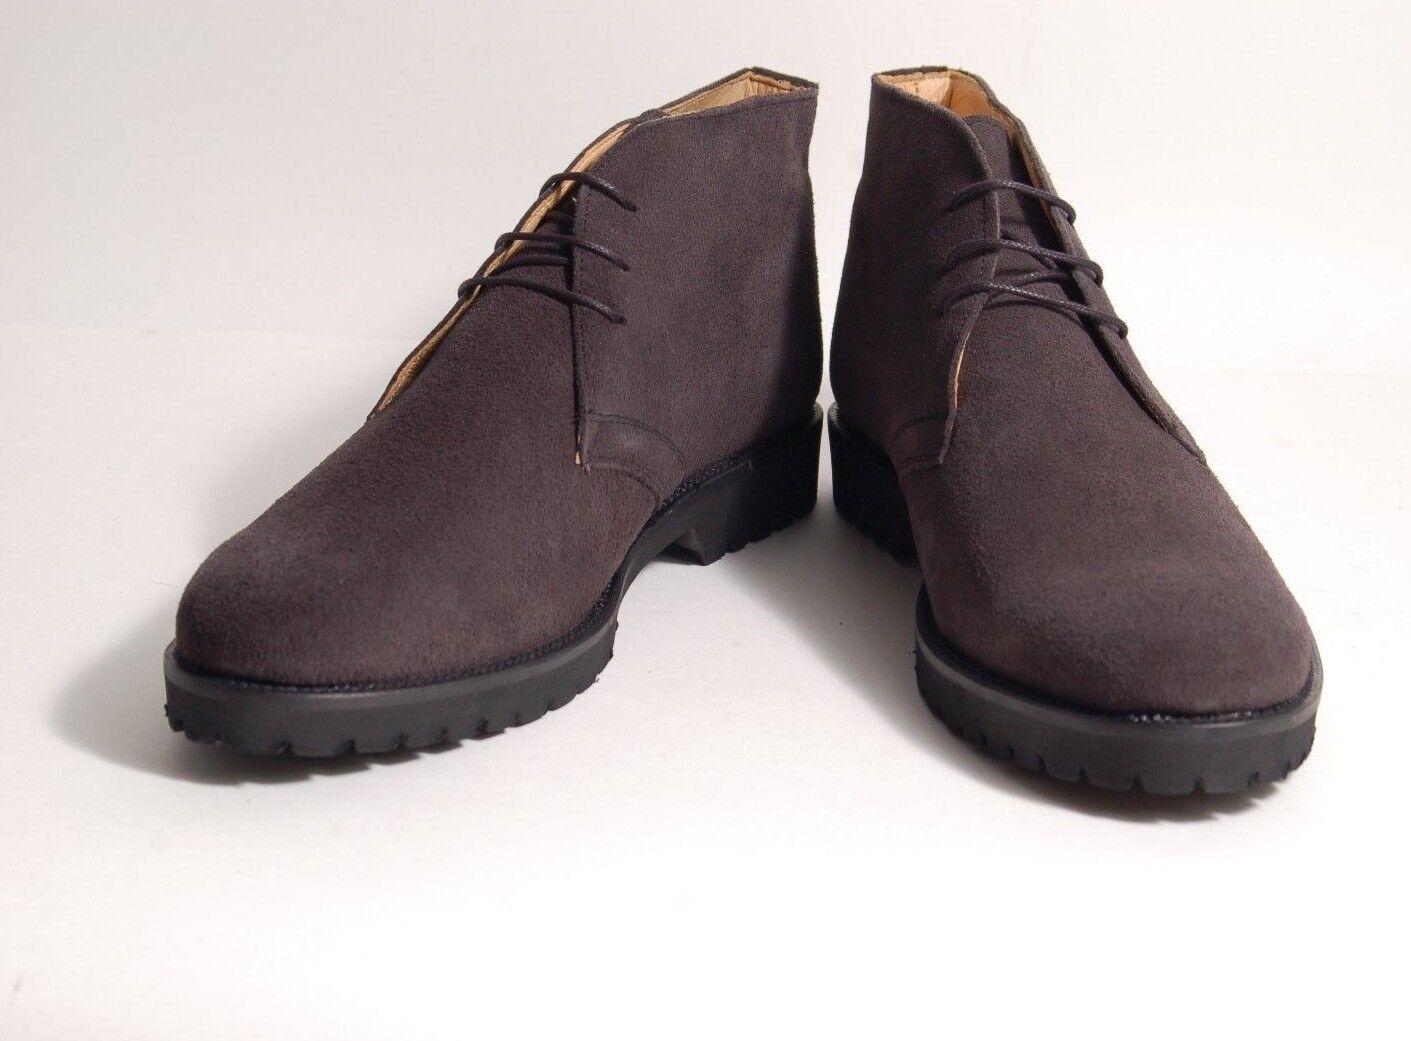 SCHUHE - ANTICA CALZOLERIA CAMPANA - halbhohe Boots